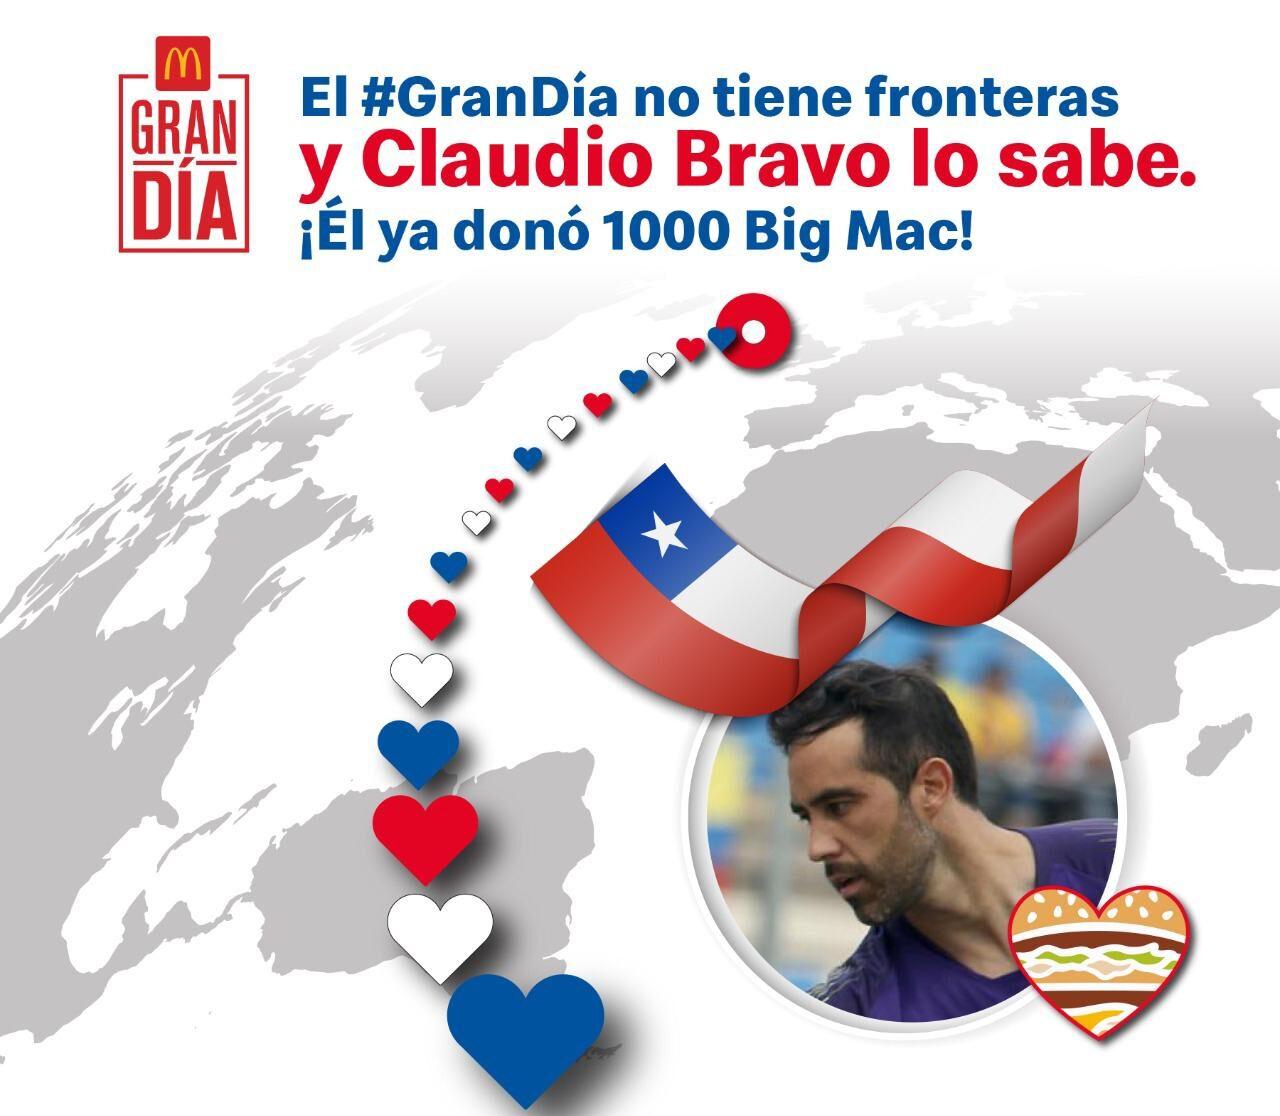 [Chile] Claudio Bravo motiva a los chilenos comprando ¡1000 hamburguesas Big Mac!